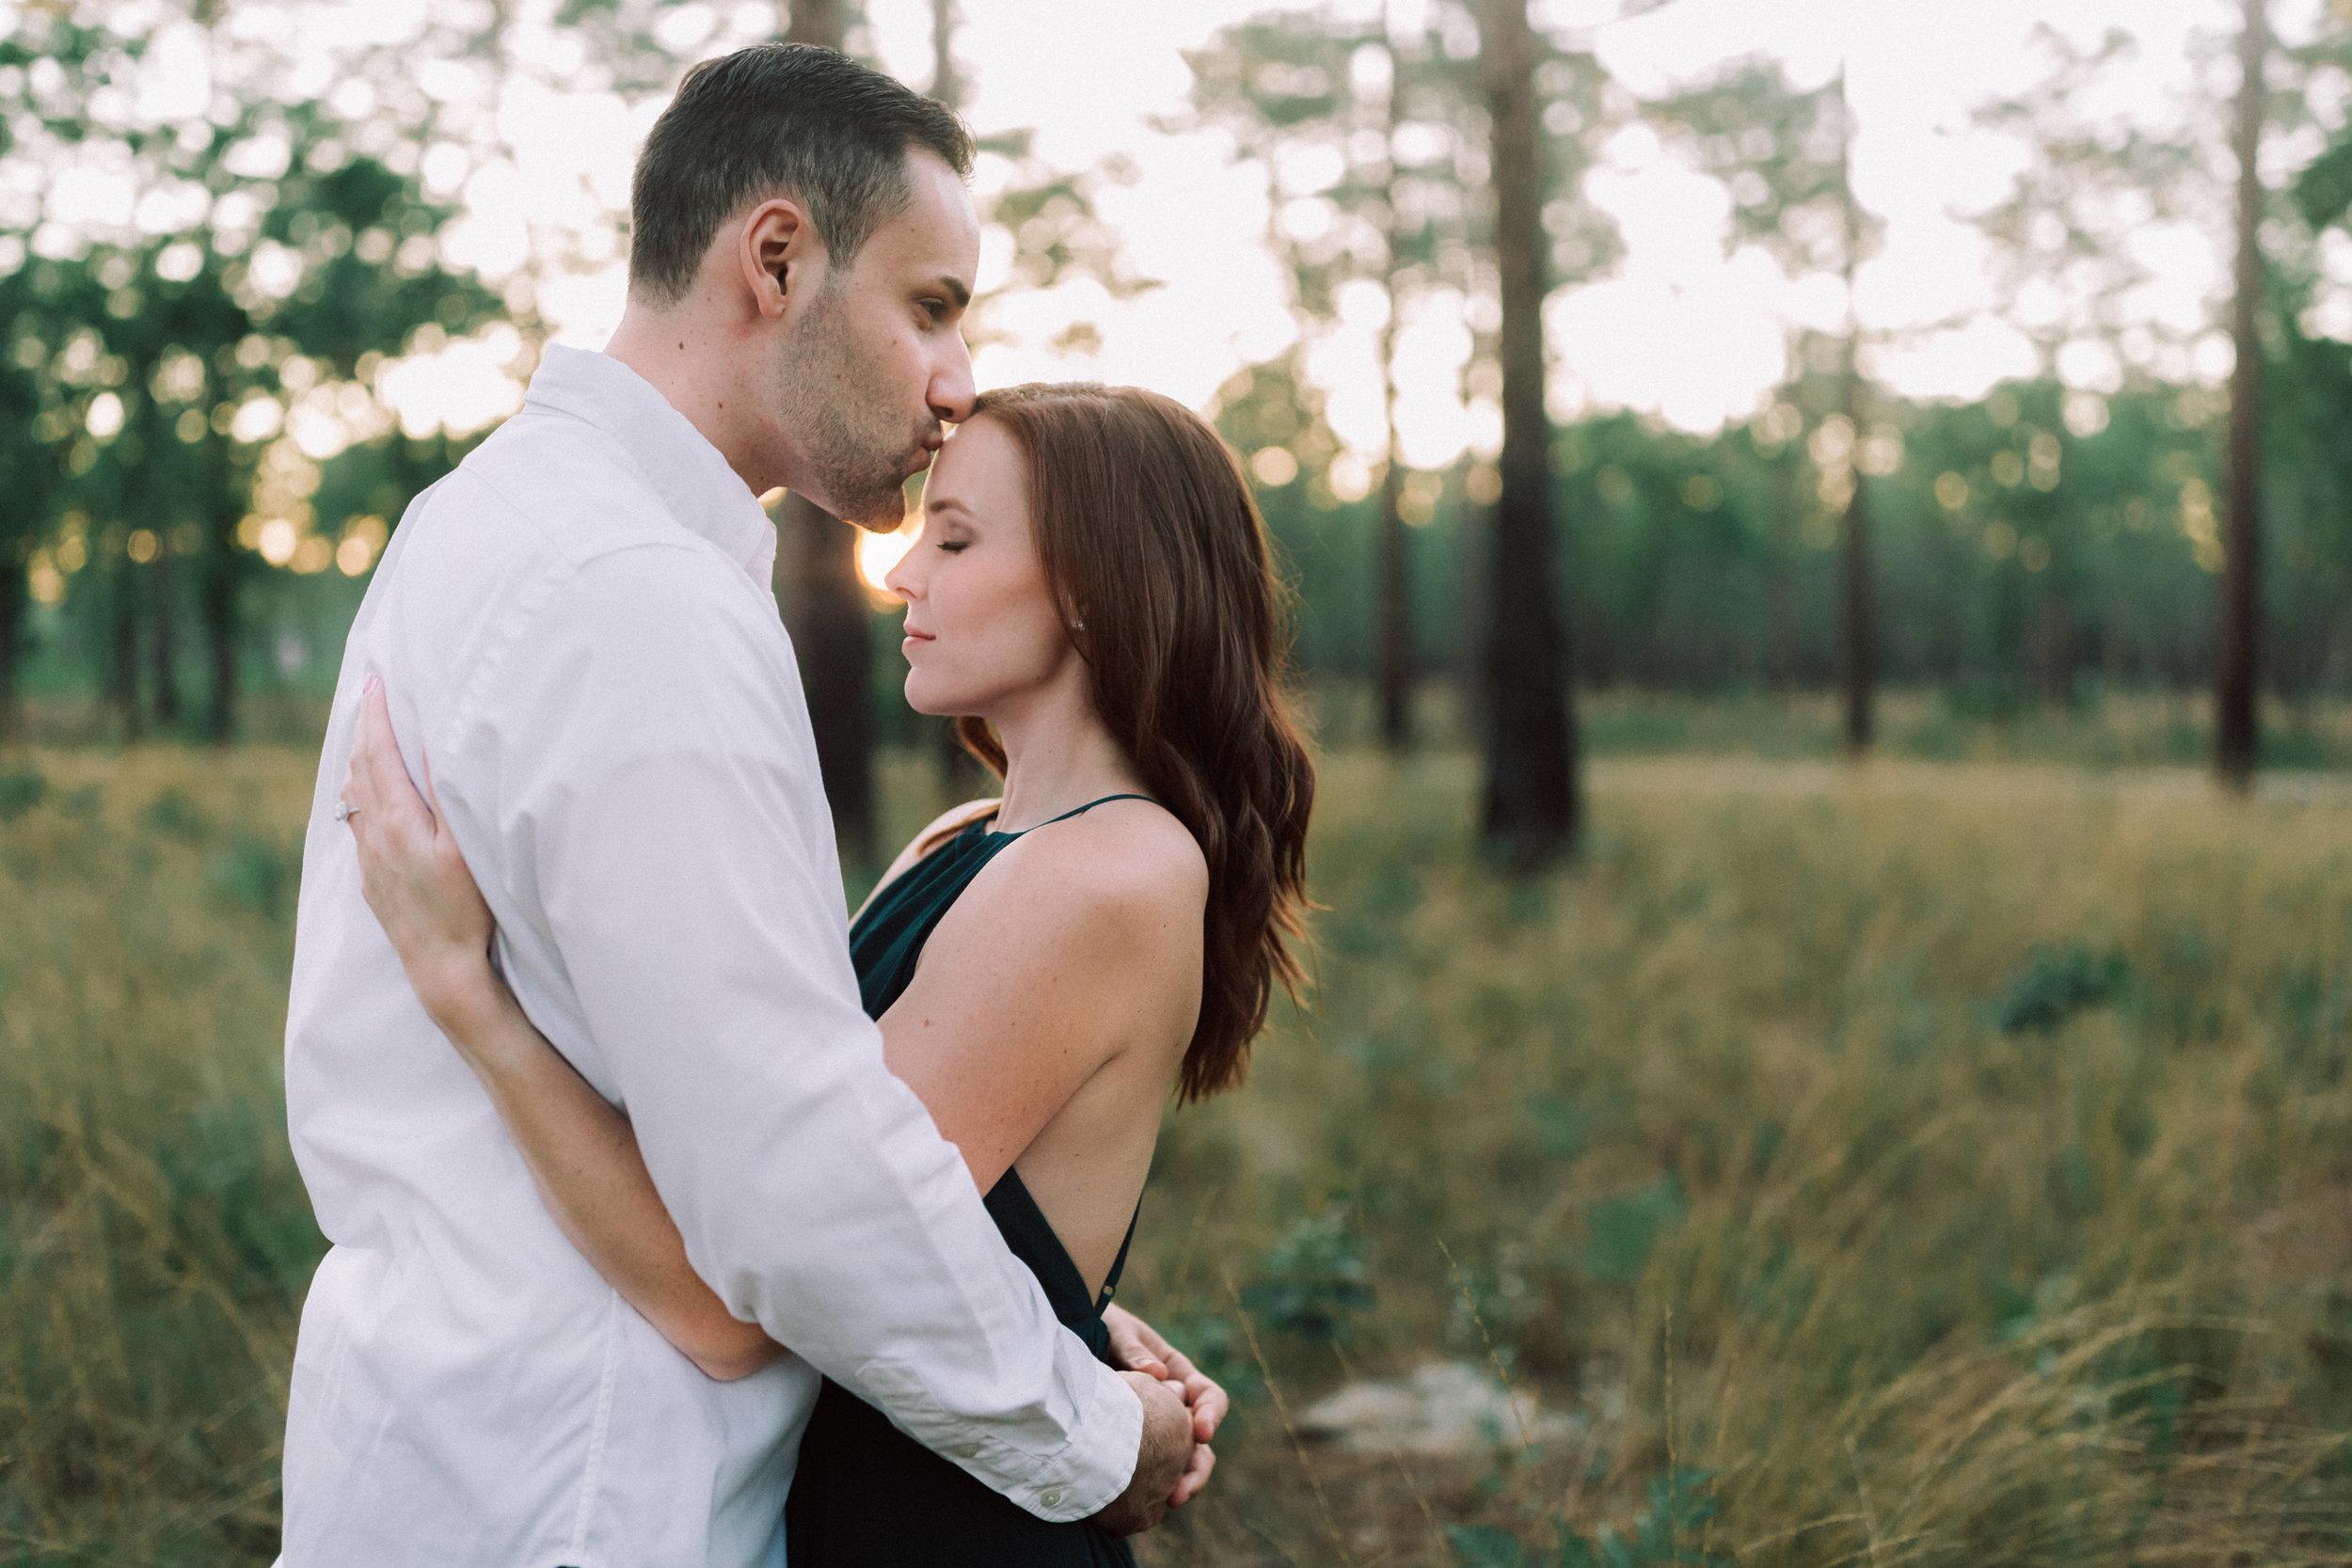 Orlando Engagement session at Wekiva Springs State Park nature-Anthony + Christine 38.jpg